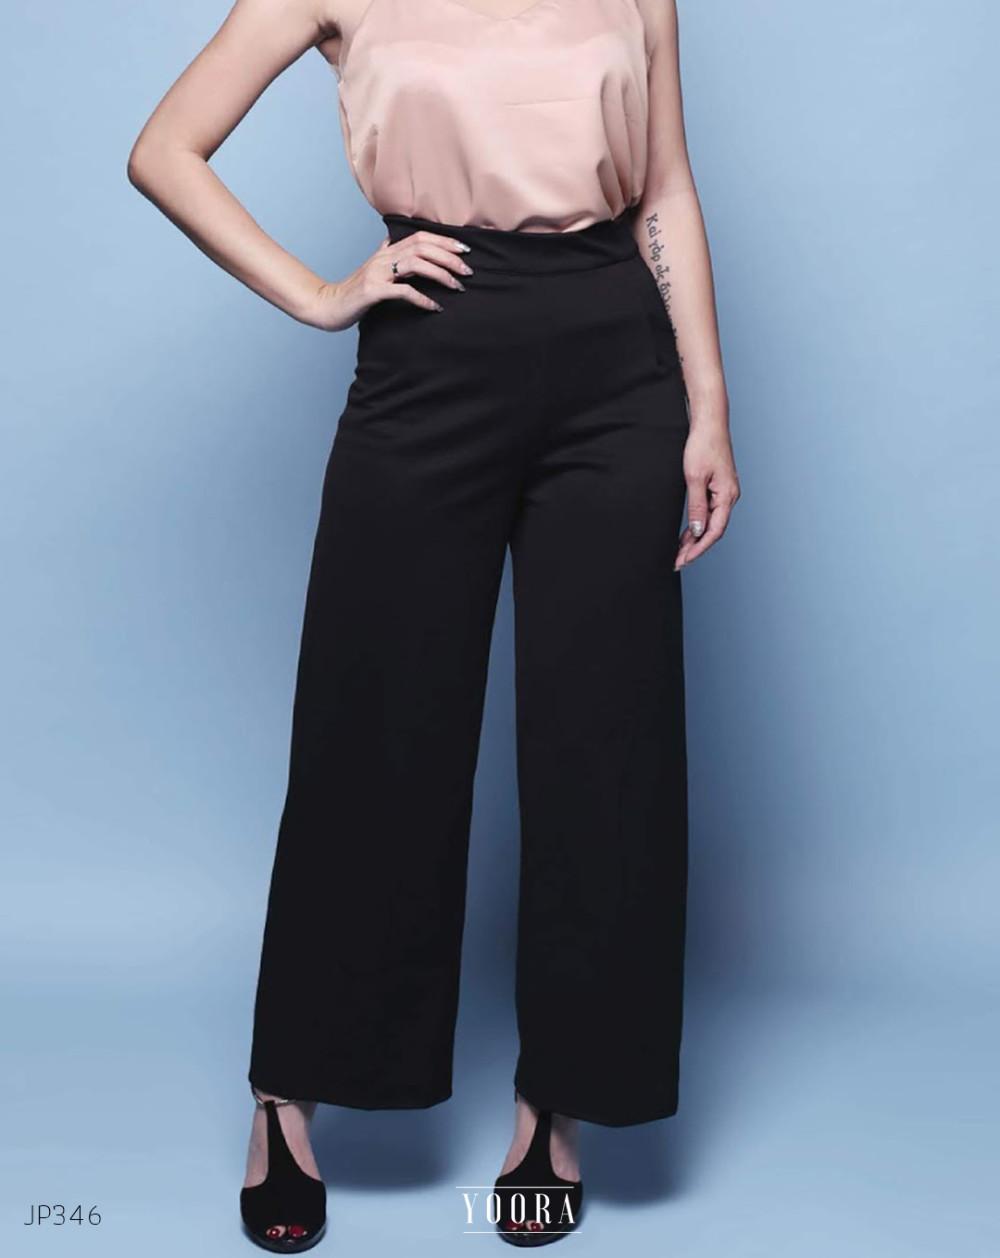 Celana kulot katun linen pants HW Highwaist premium murah